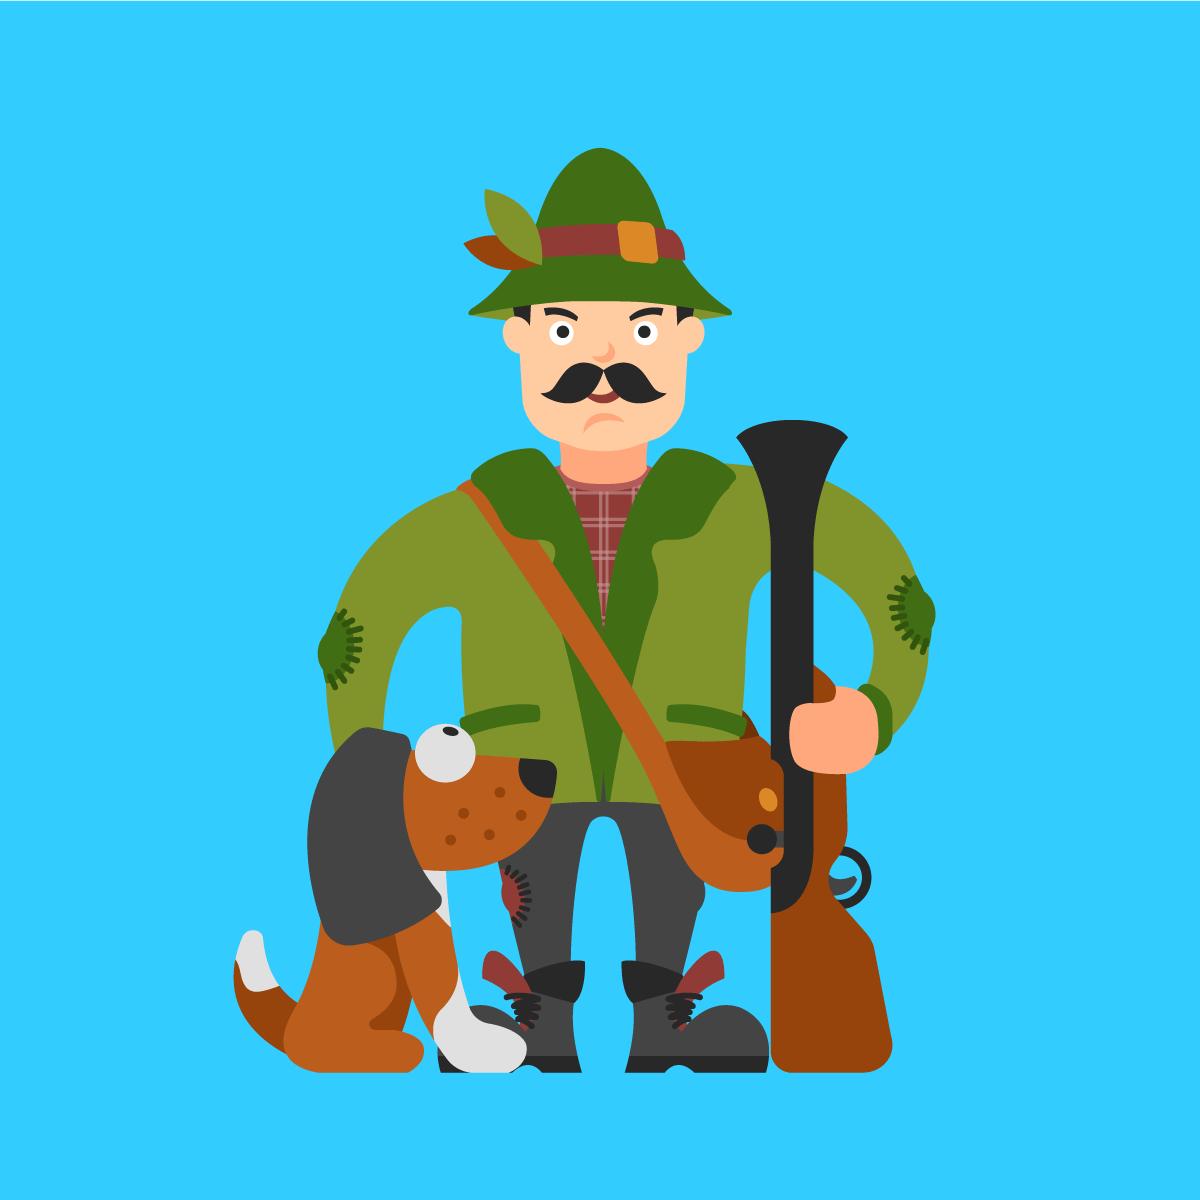 Охотник картинка нарисованная